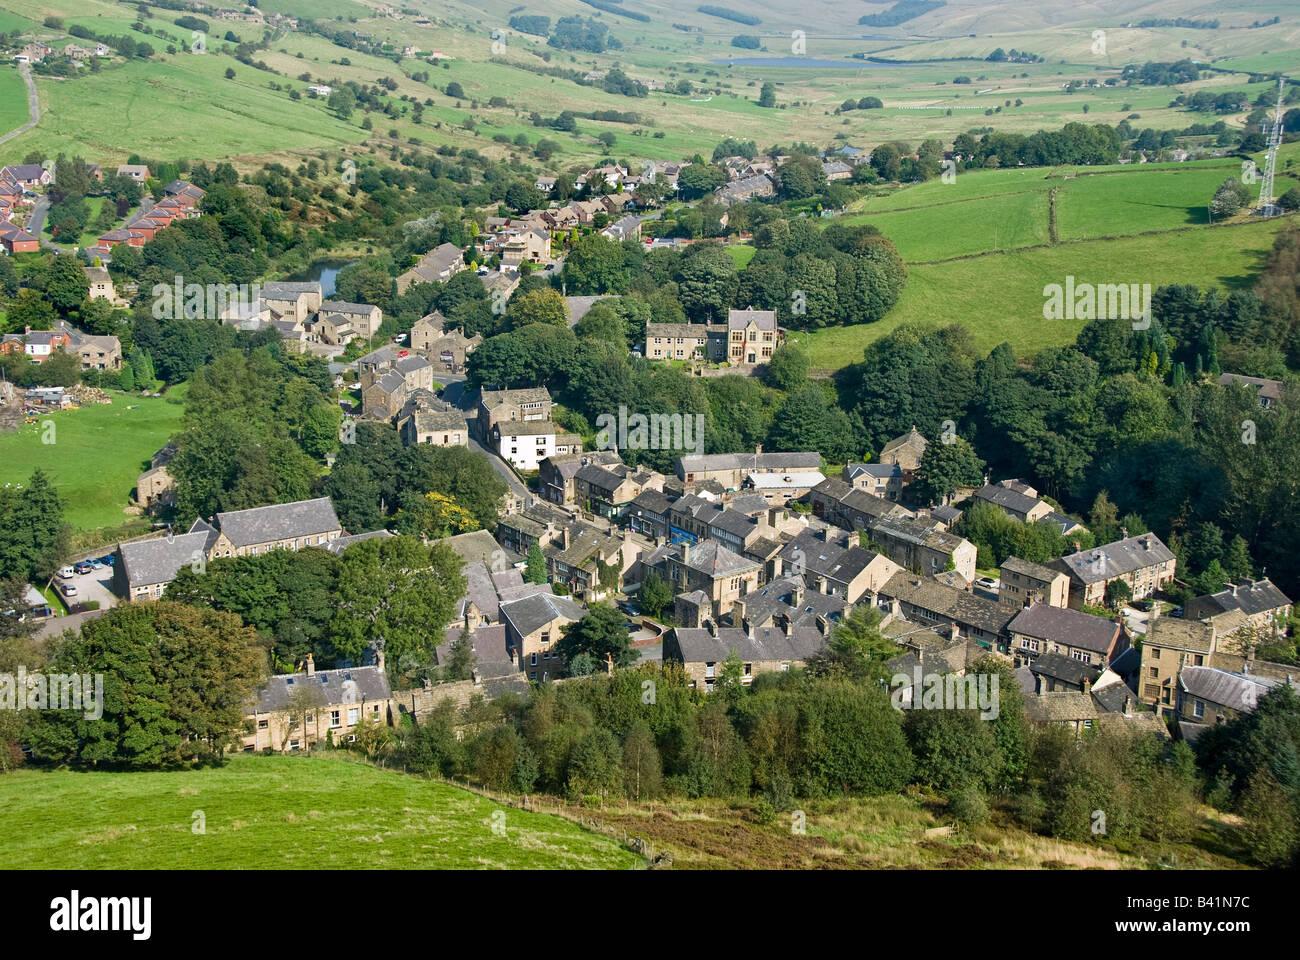 Delph Village, - Stock Image